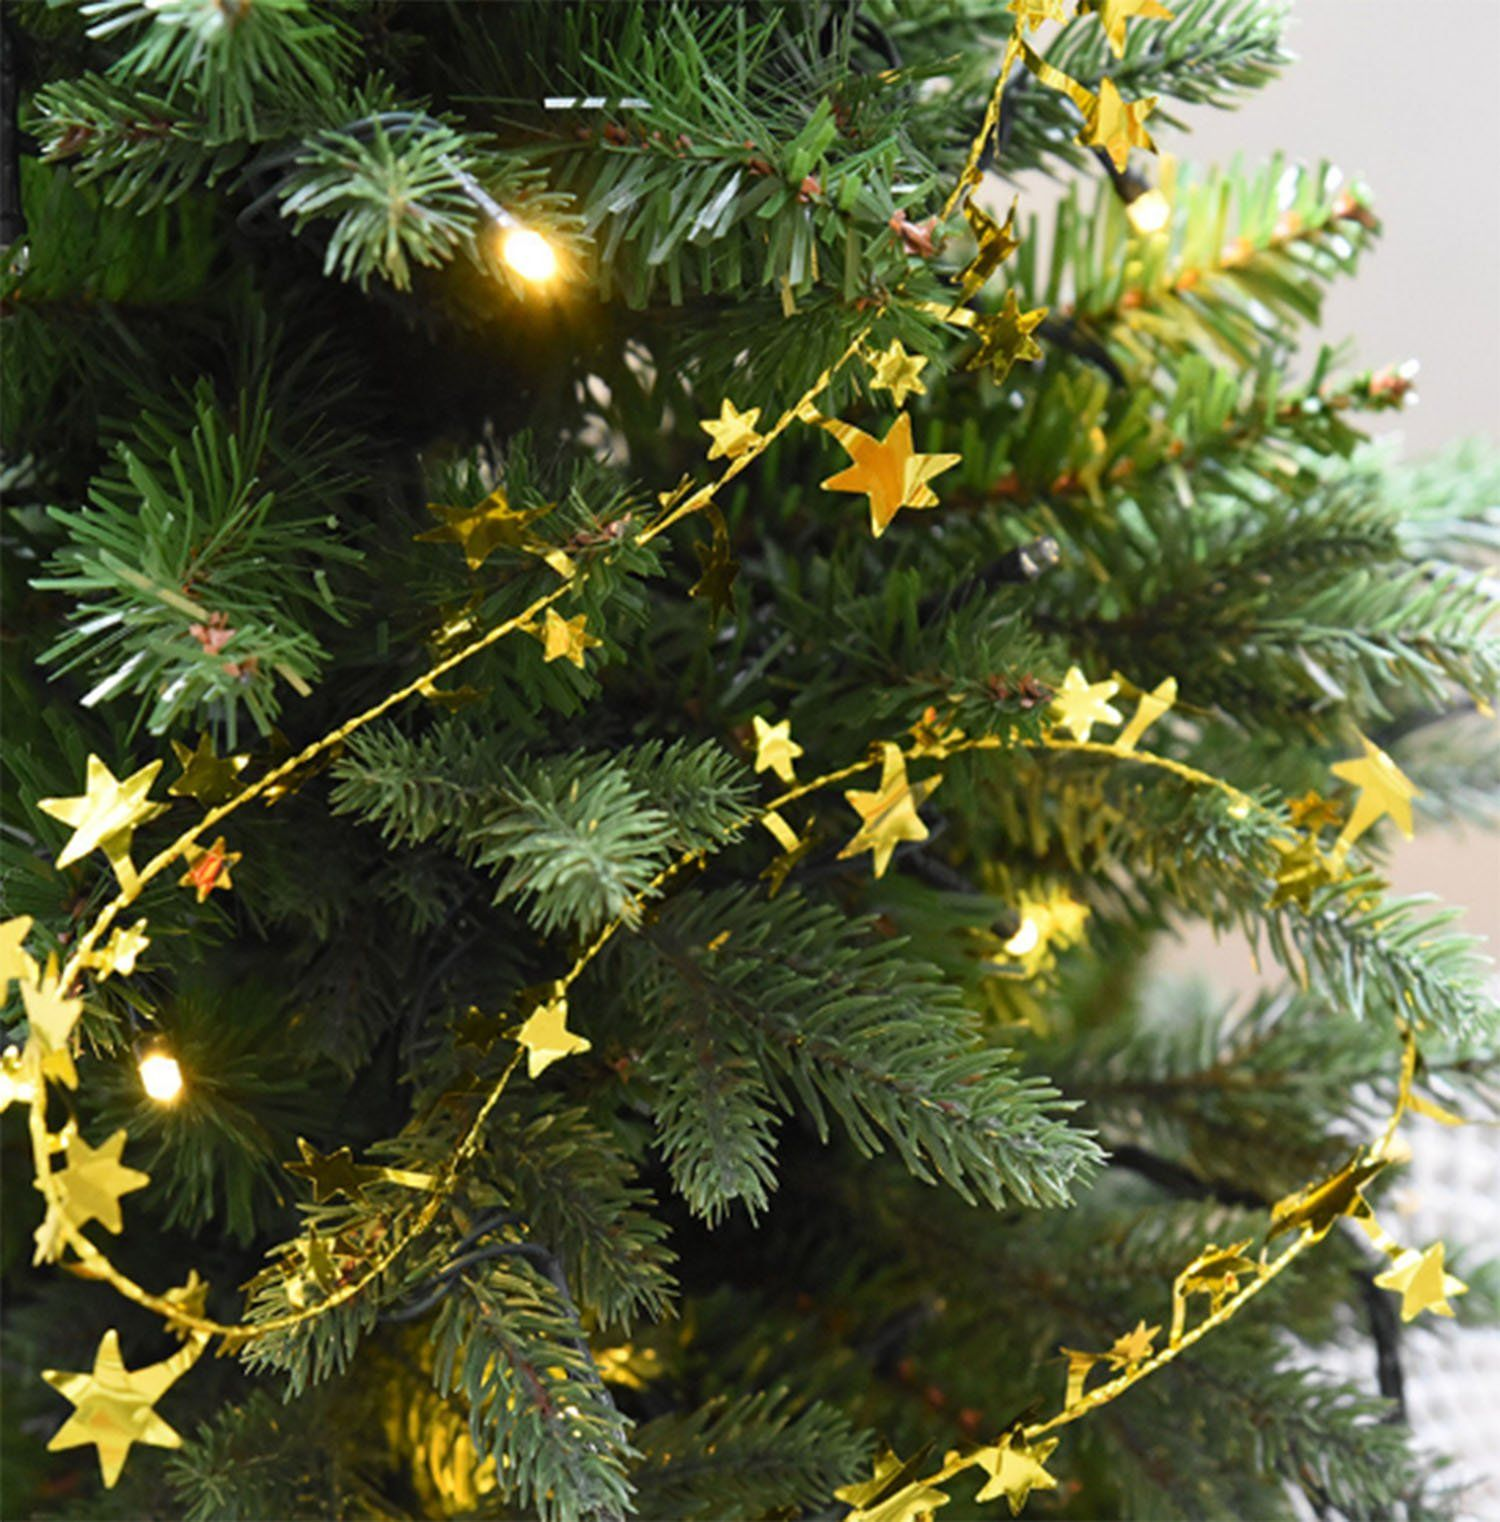 Christmas Garlands Star Pine Rattan Xmas Tree Hanging Ornament Home Decoration